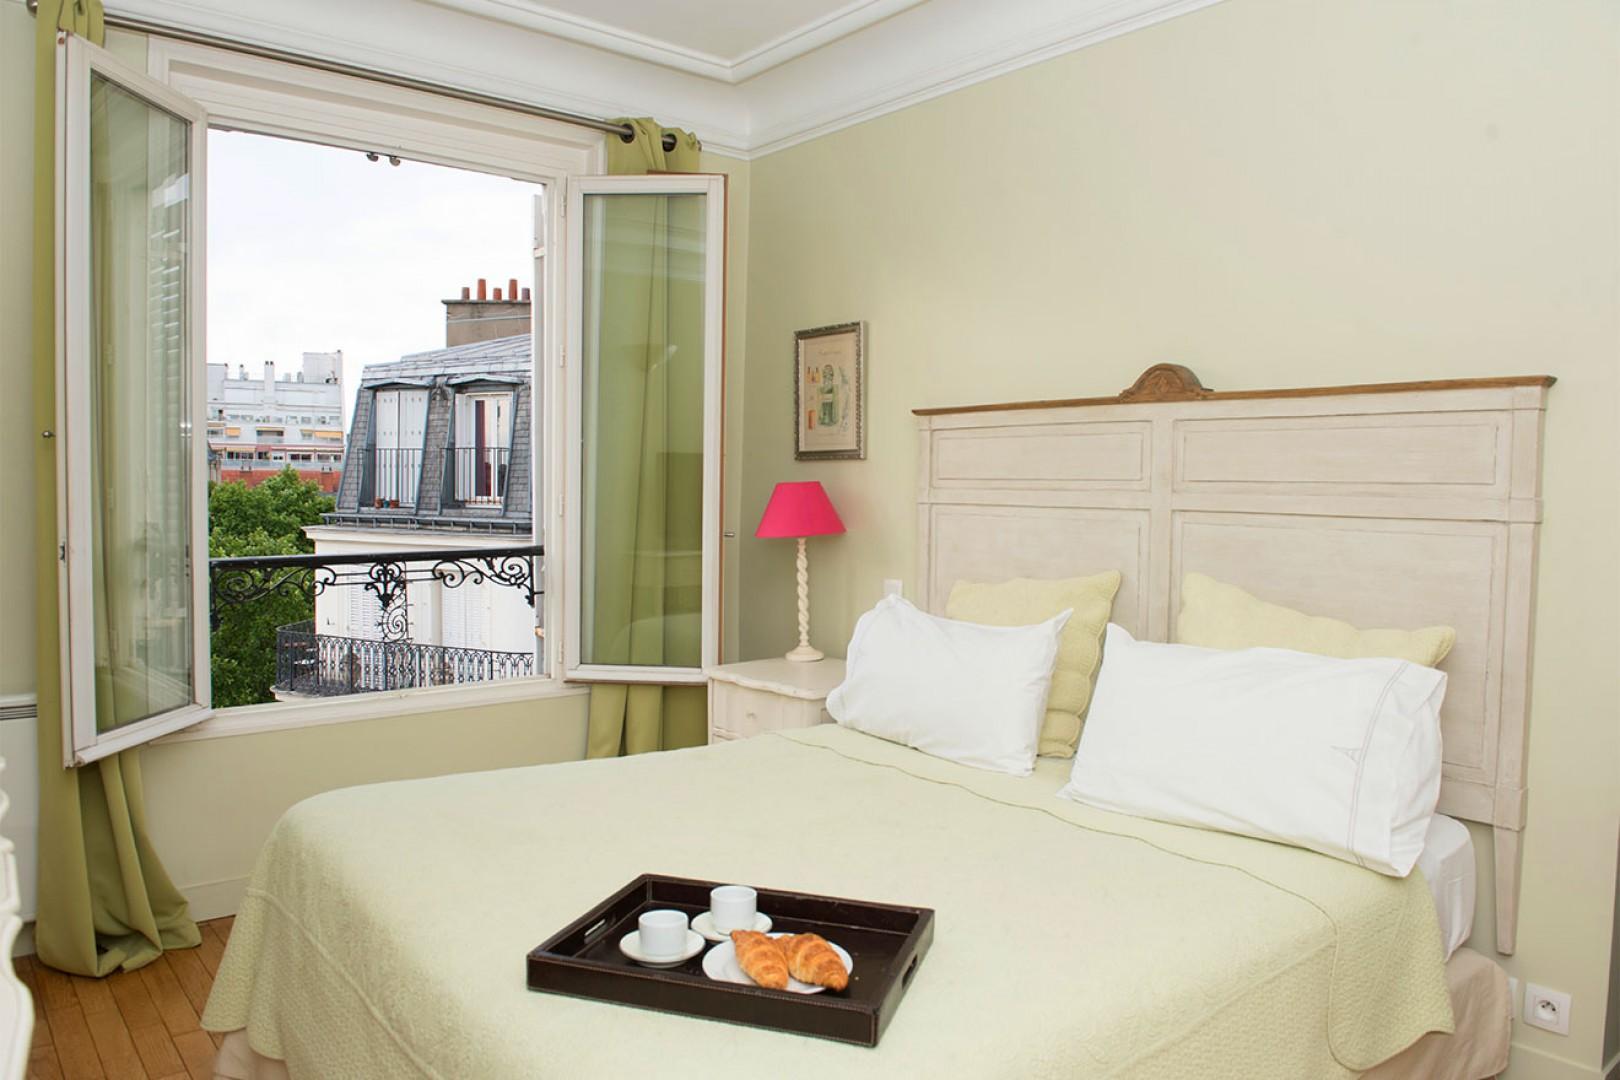 Enjoy French breakfast in bed in charming bedroom 1